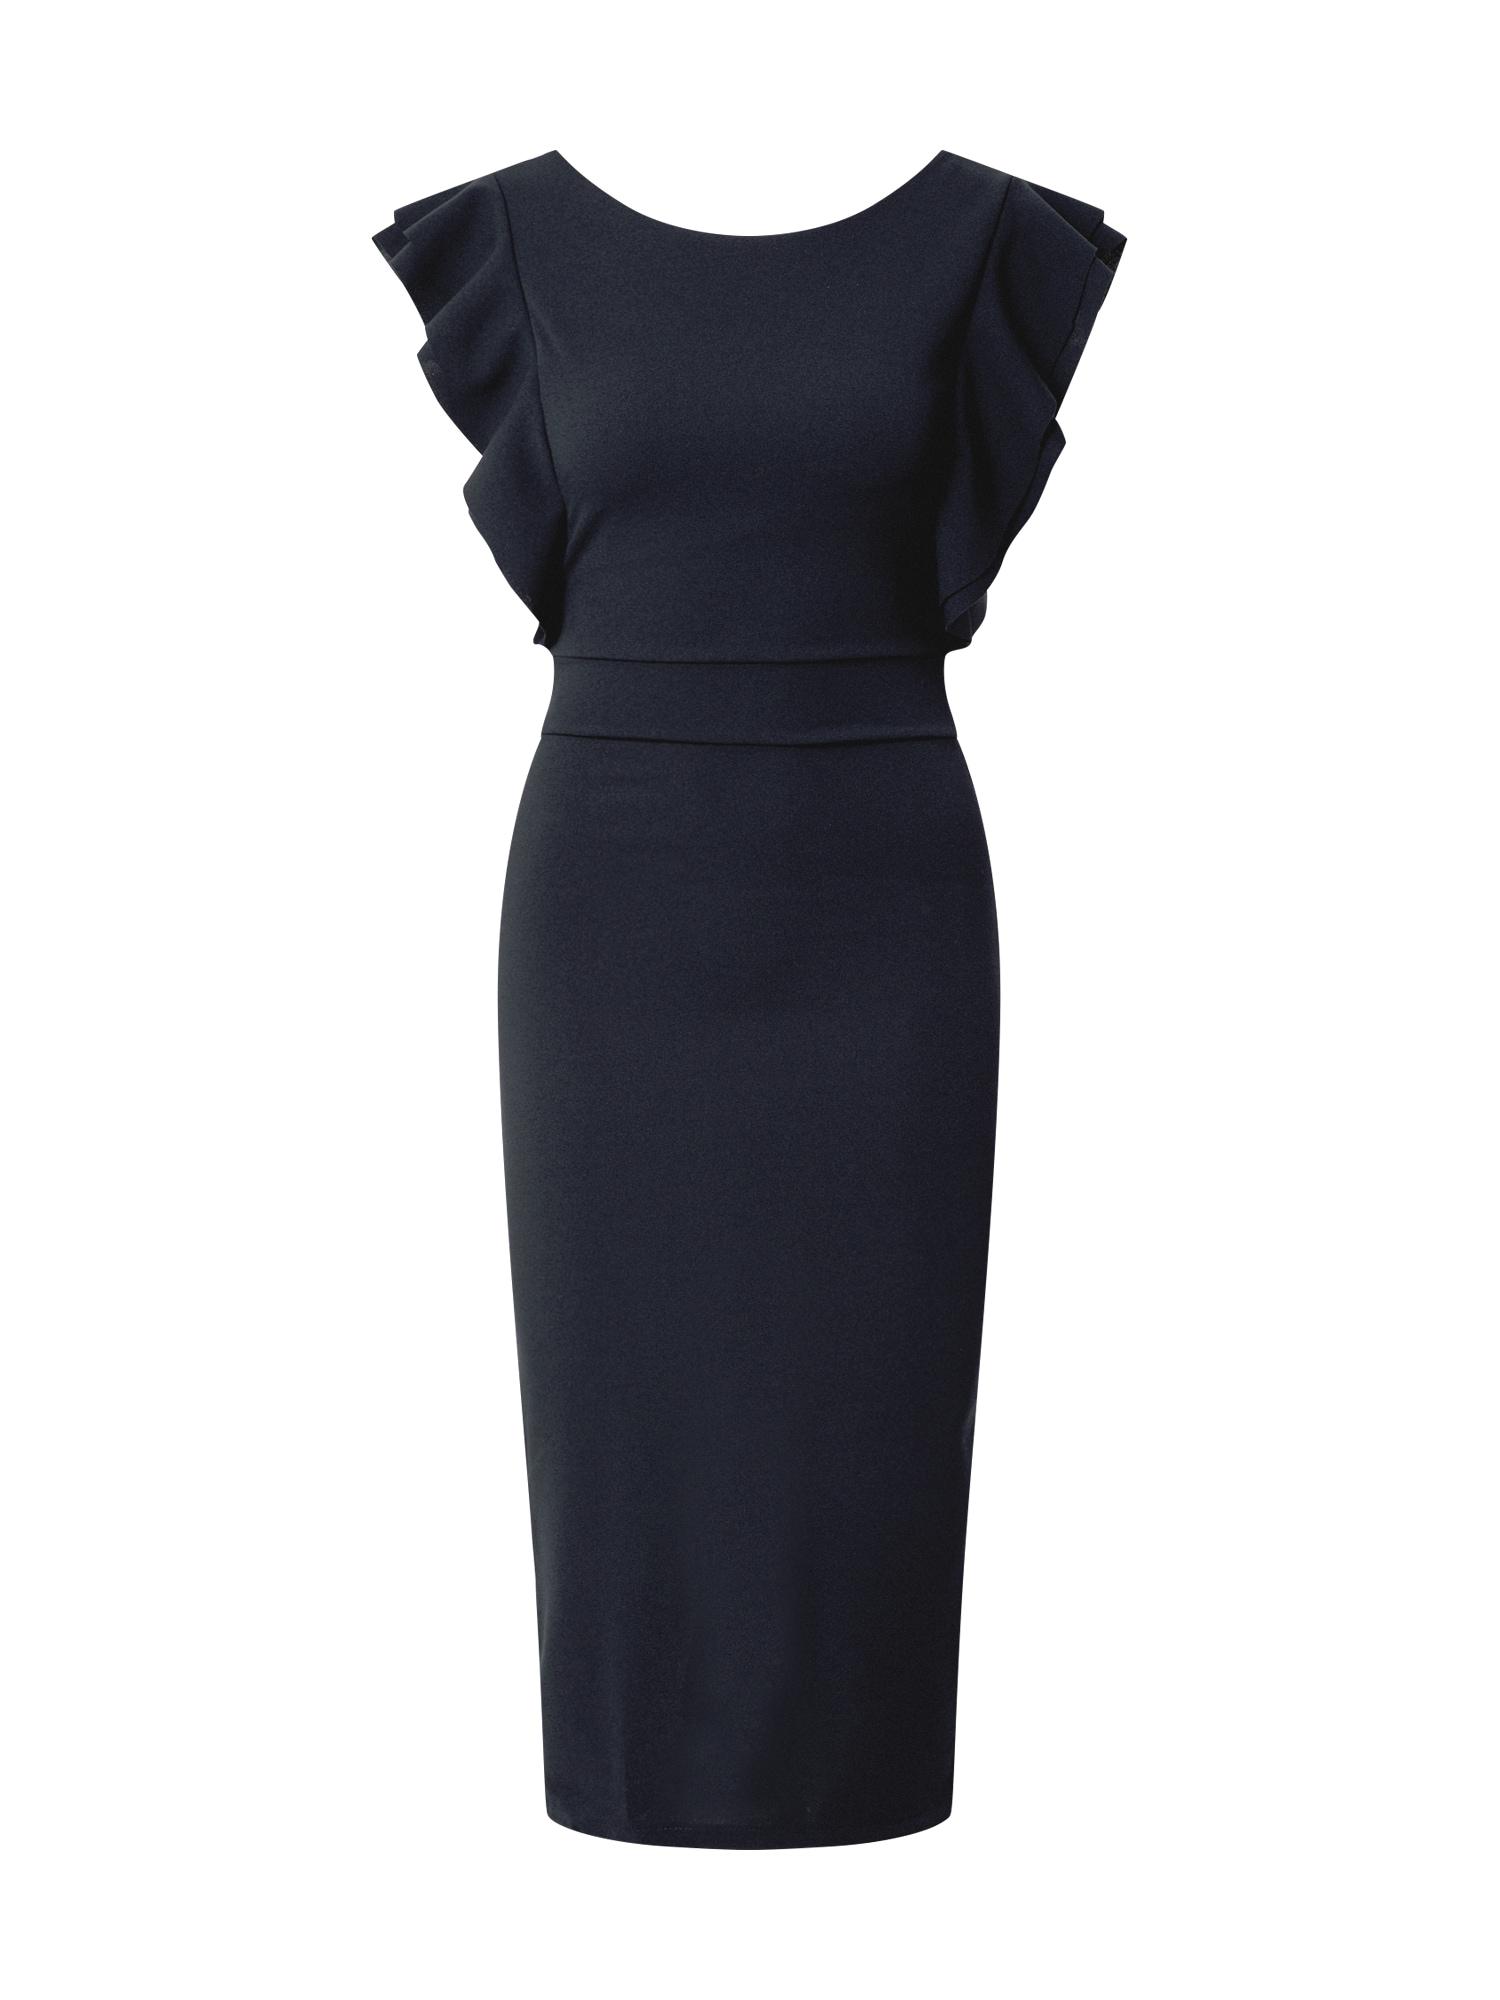 WAL G. Trumpa kokteilinė suknelė kobalto mėlyna